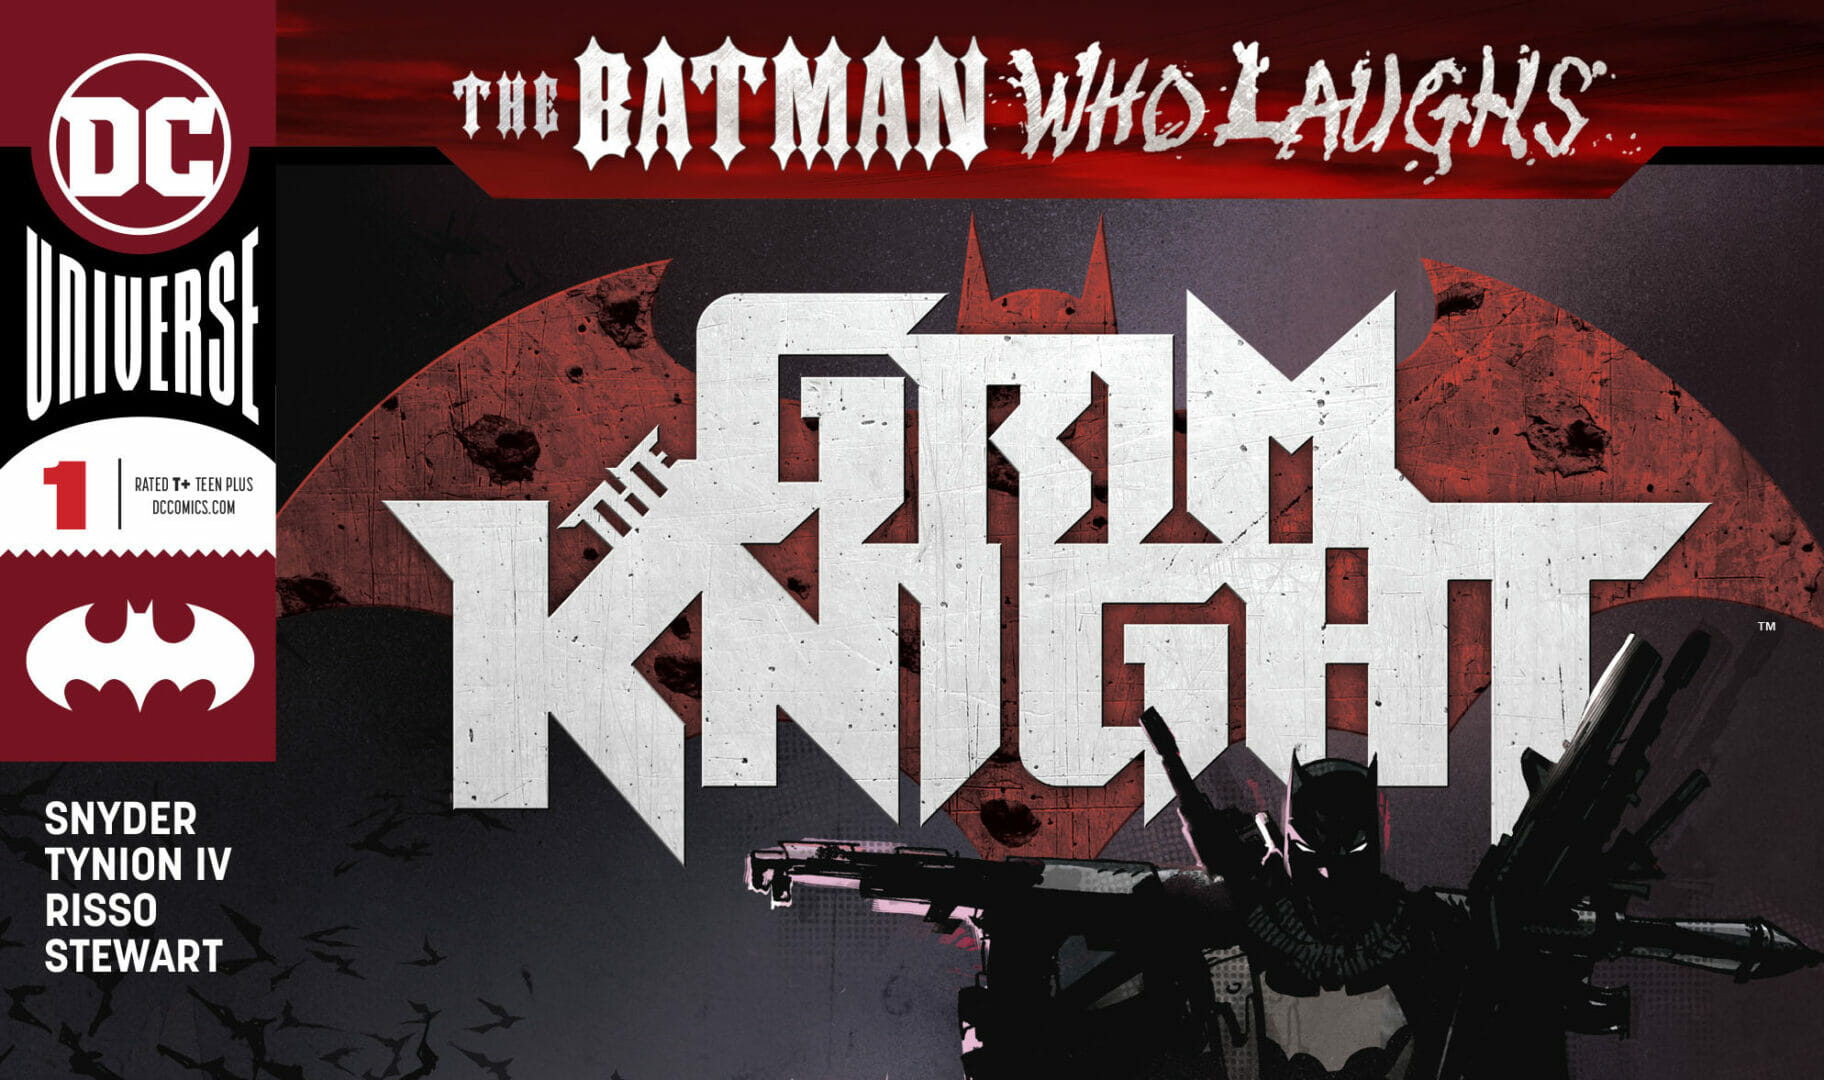 The Grim Knight